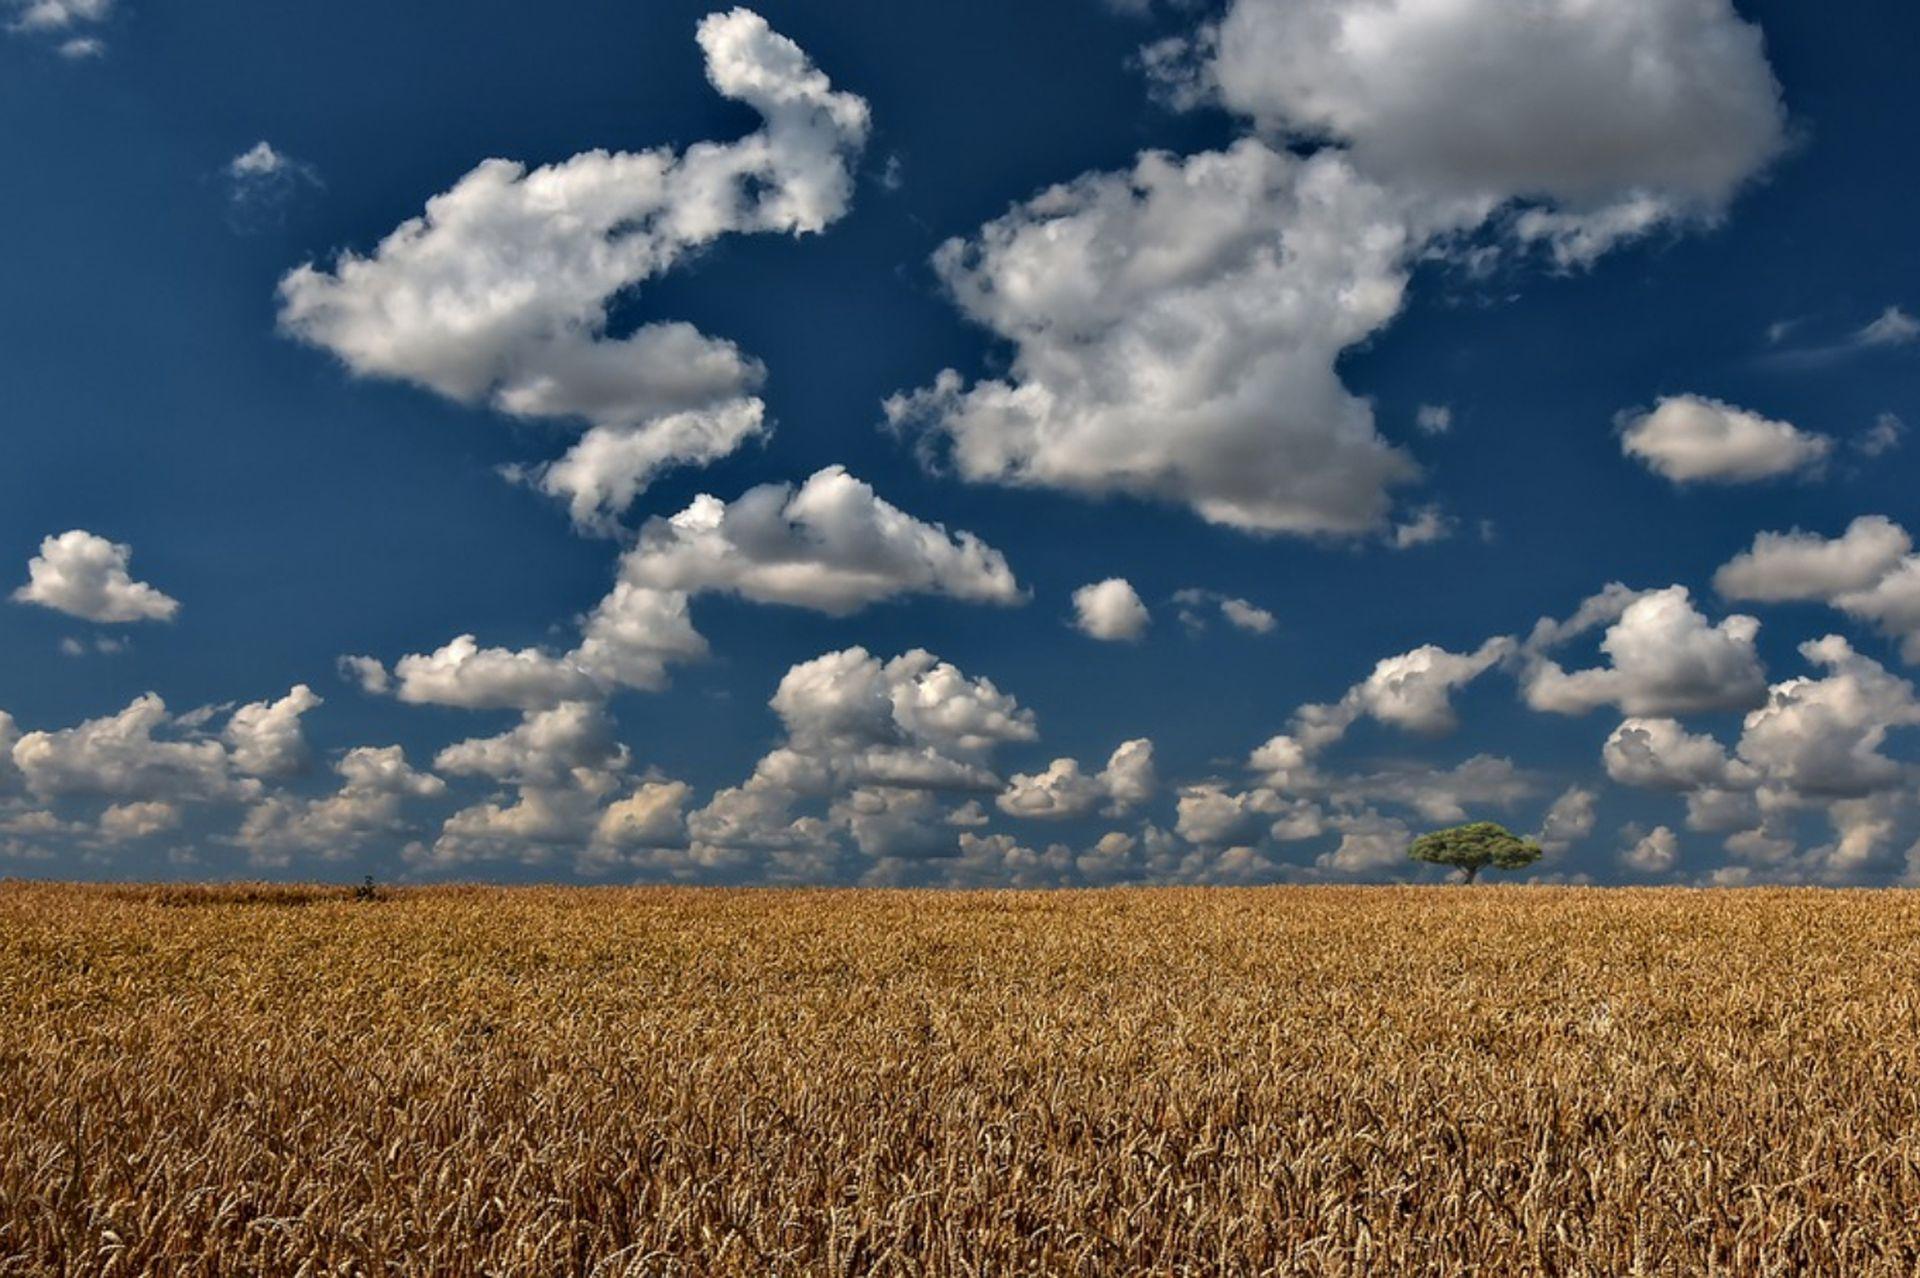 Sandra creció rodeada de campos de trigo, en Salto, provincia de Buenos Aires.